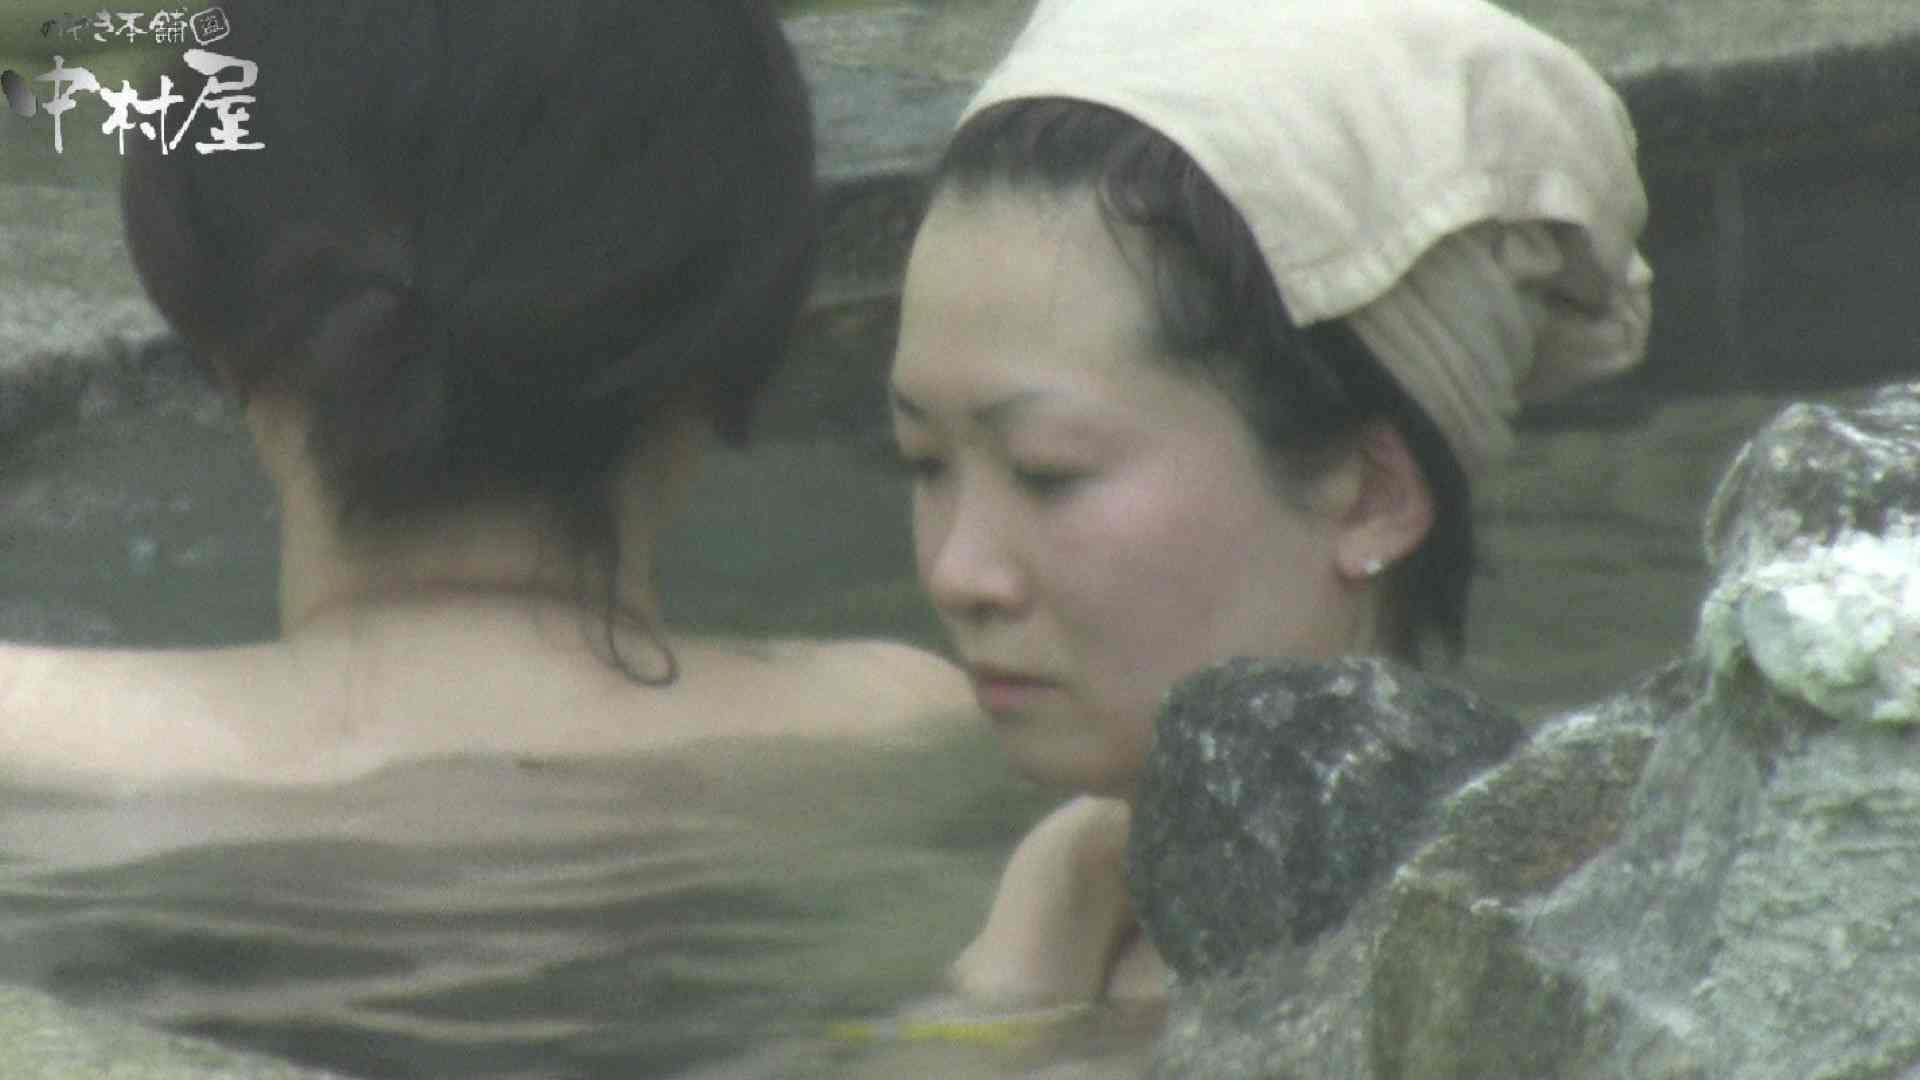 Aquaな露天風呂Vol.906 露天風呂編  86PIX 6